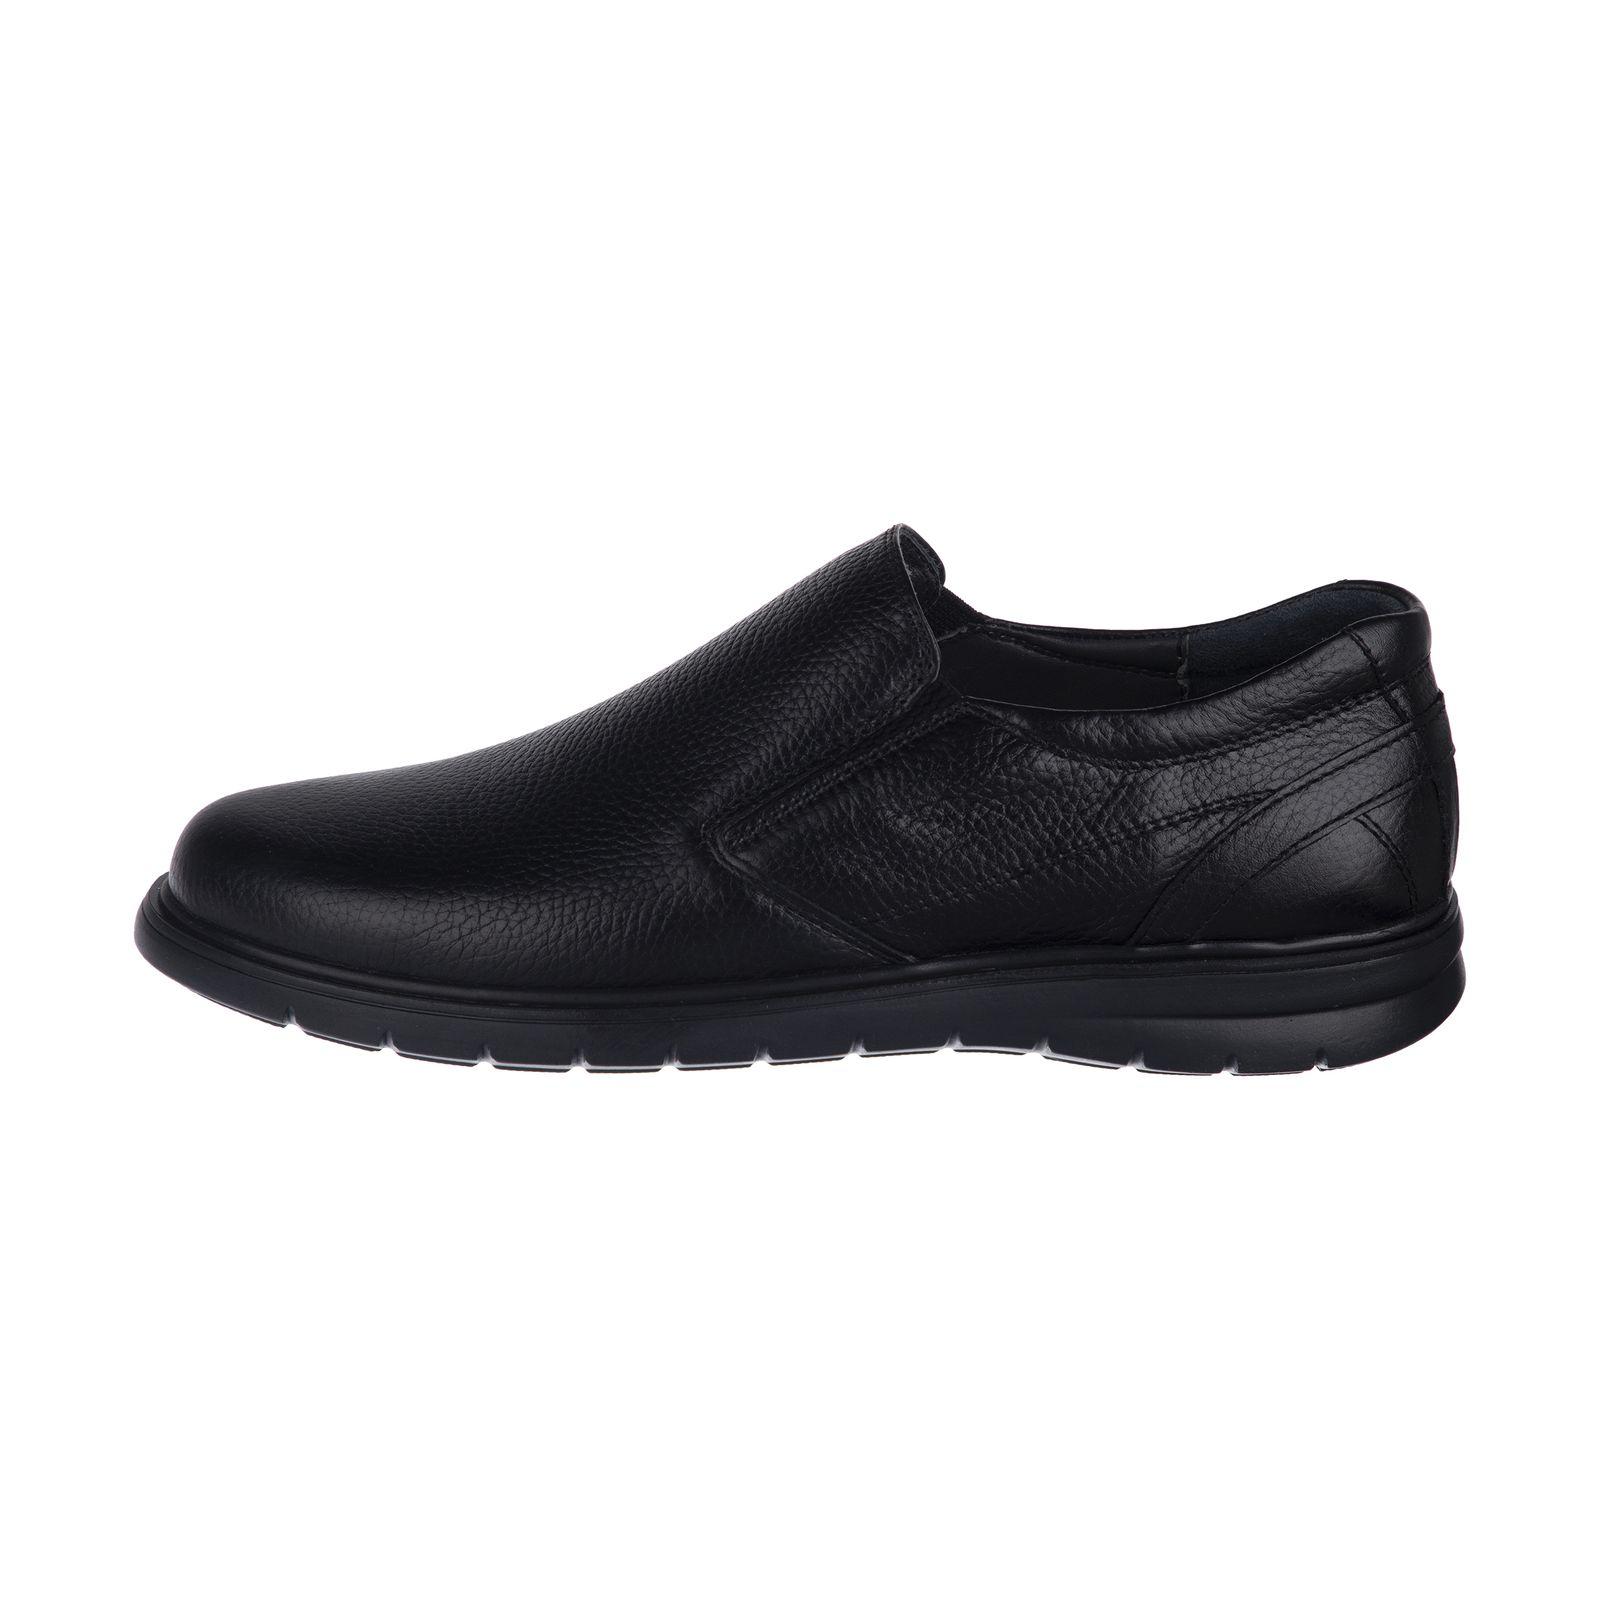 کفش روزمره مردانه دلفارد مدل 8334A503101 -  - 2